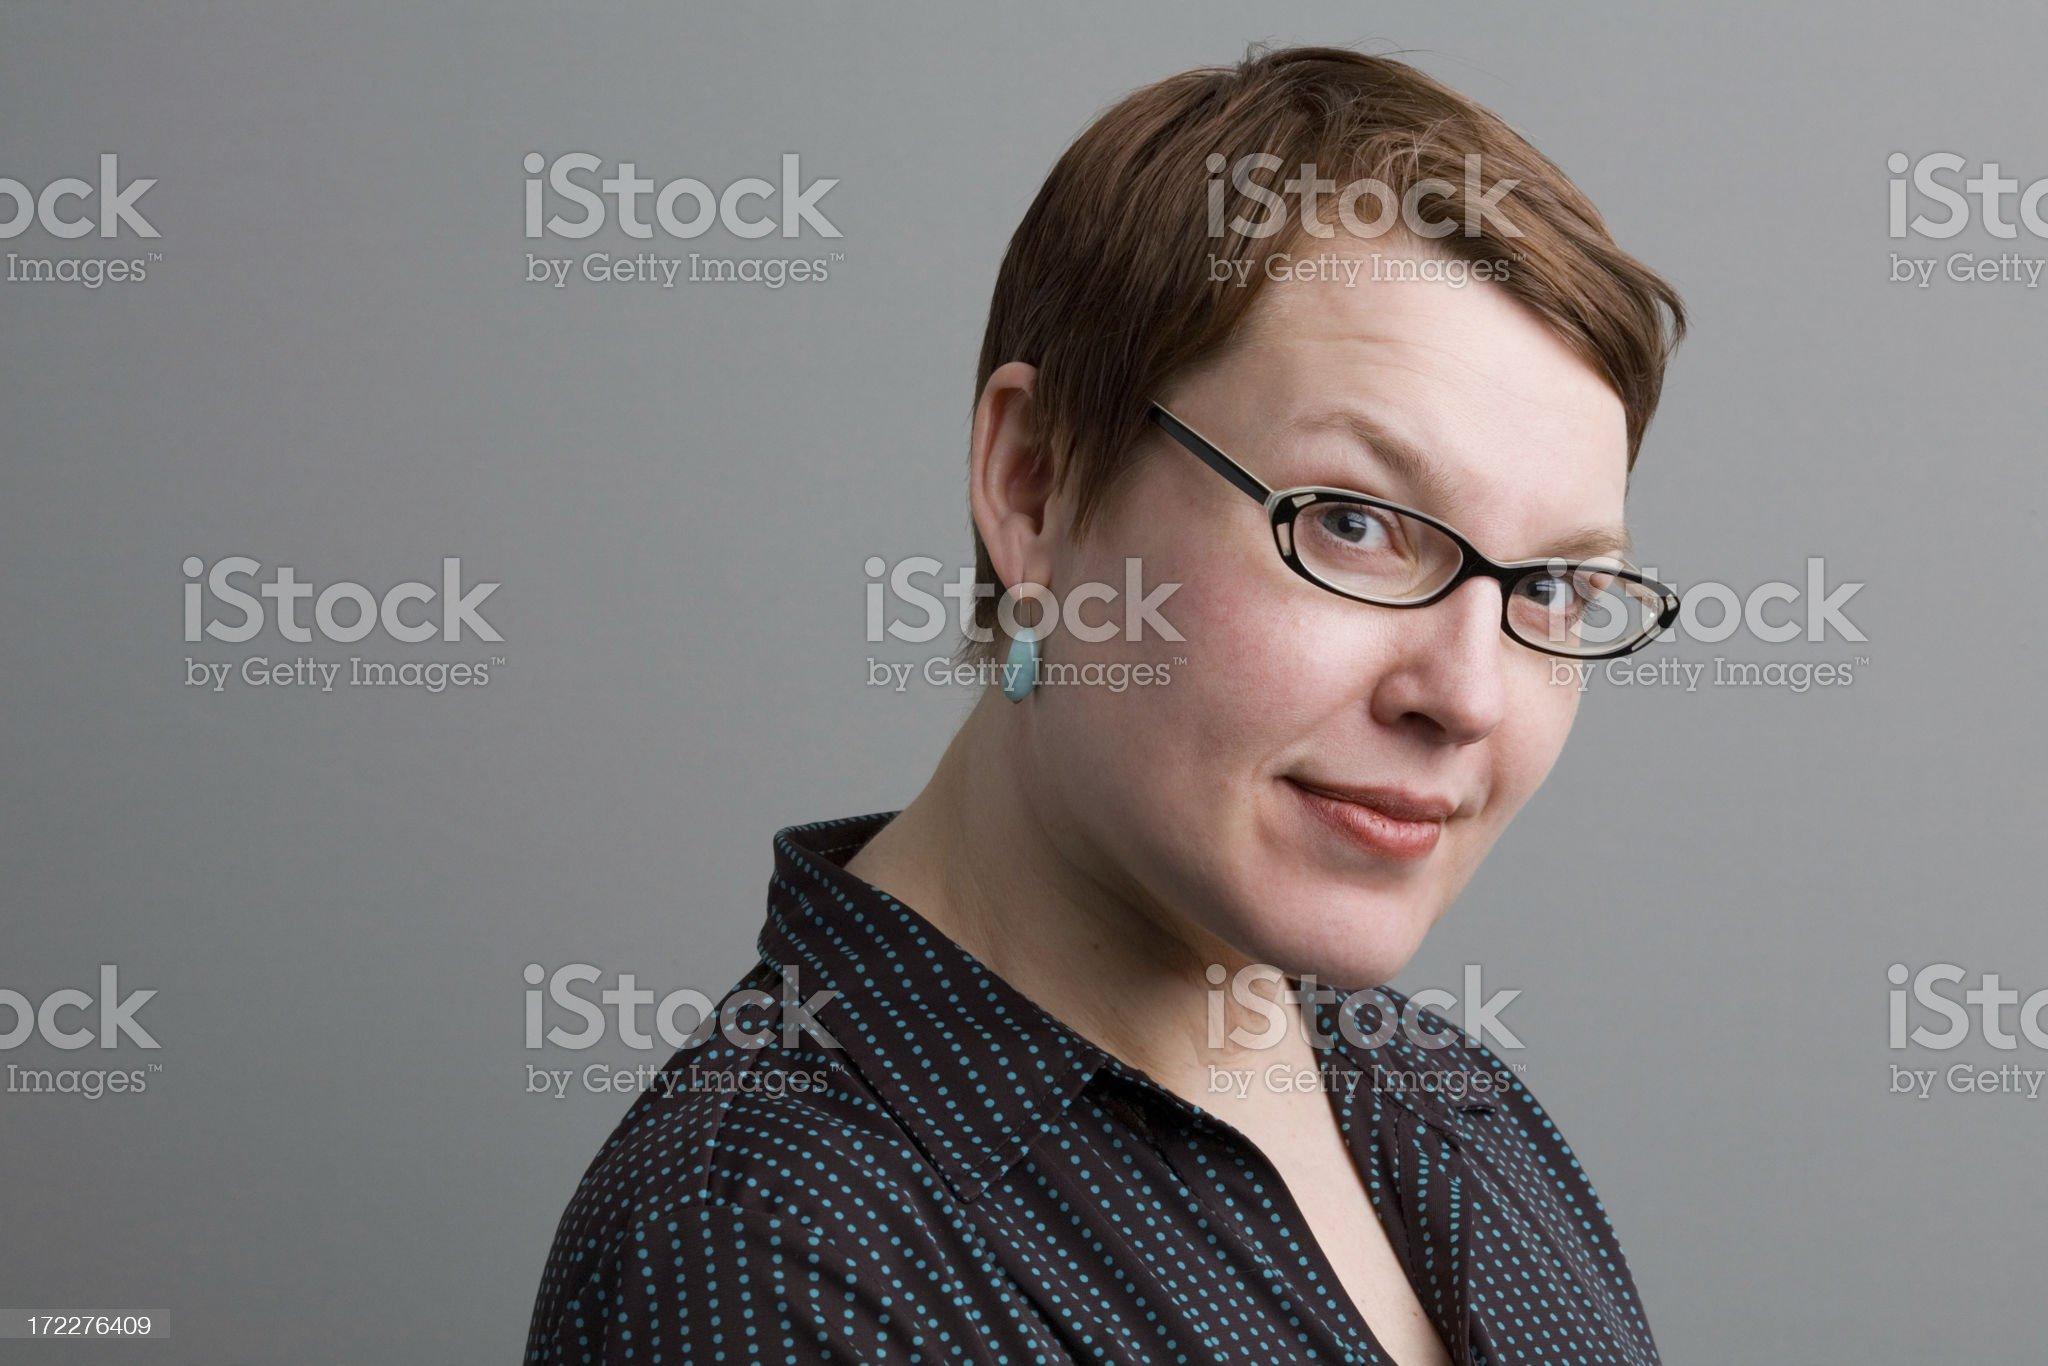 Modern Professional royalty-free stock photo